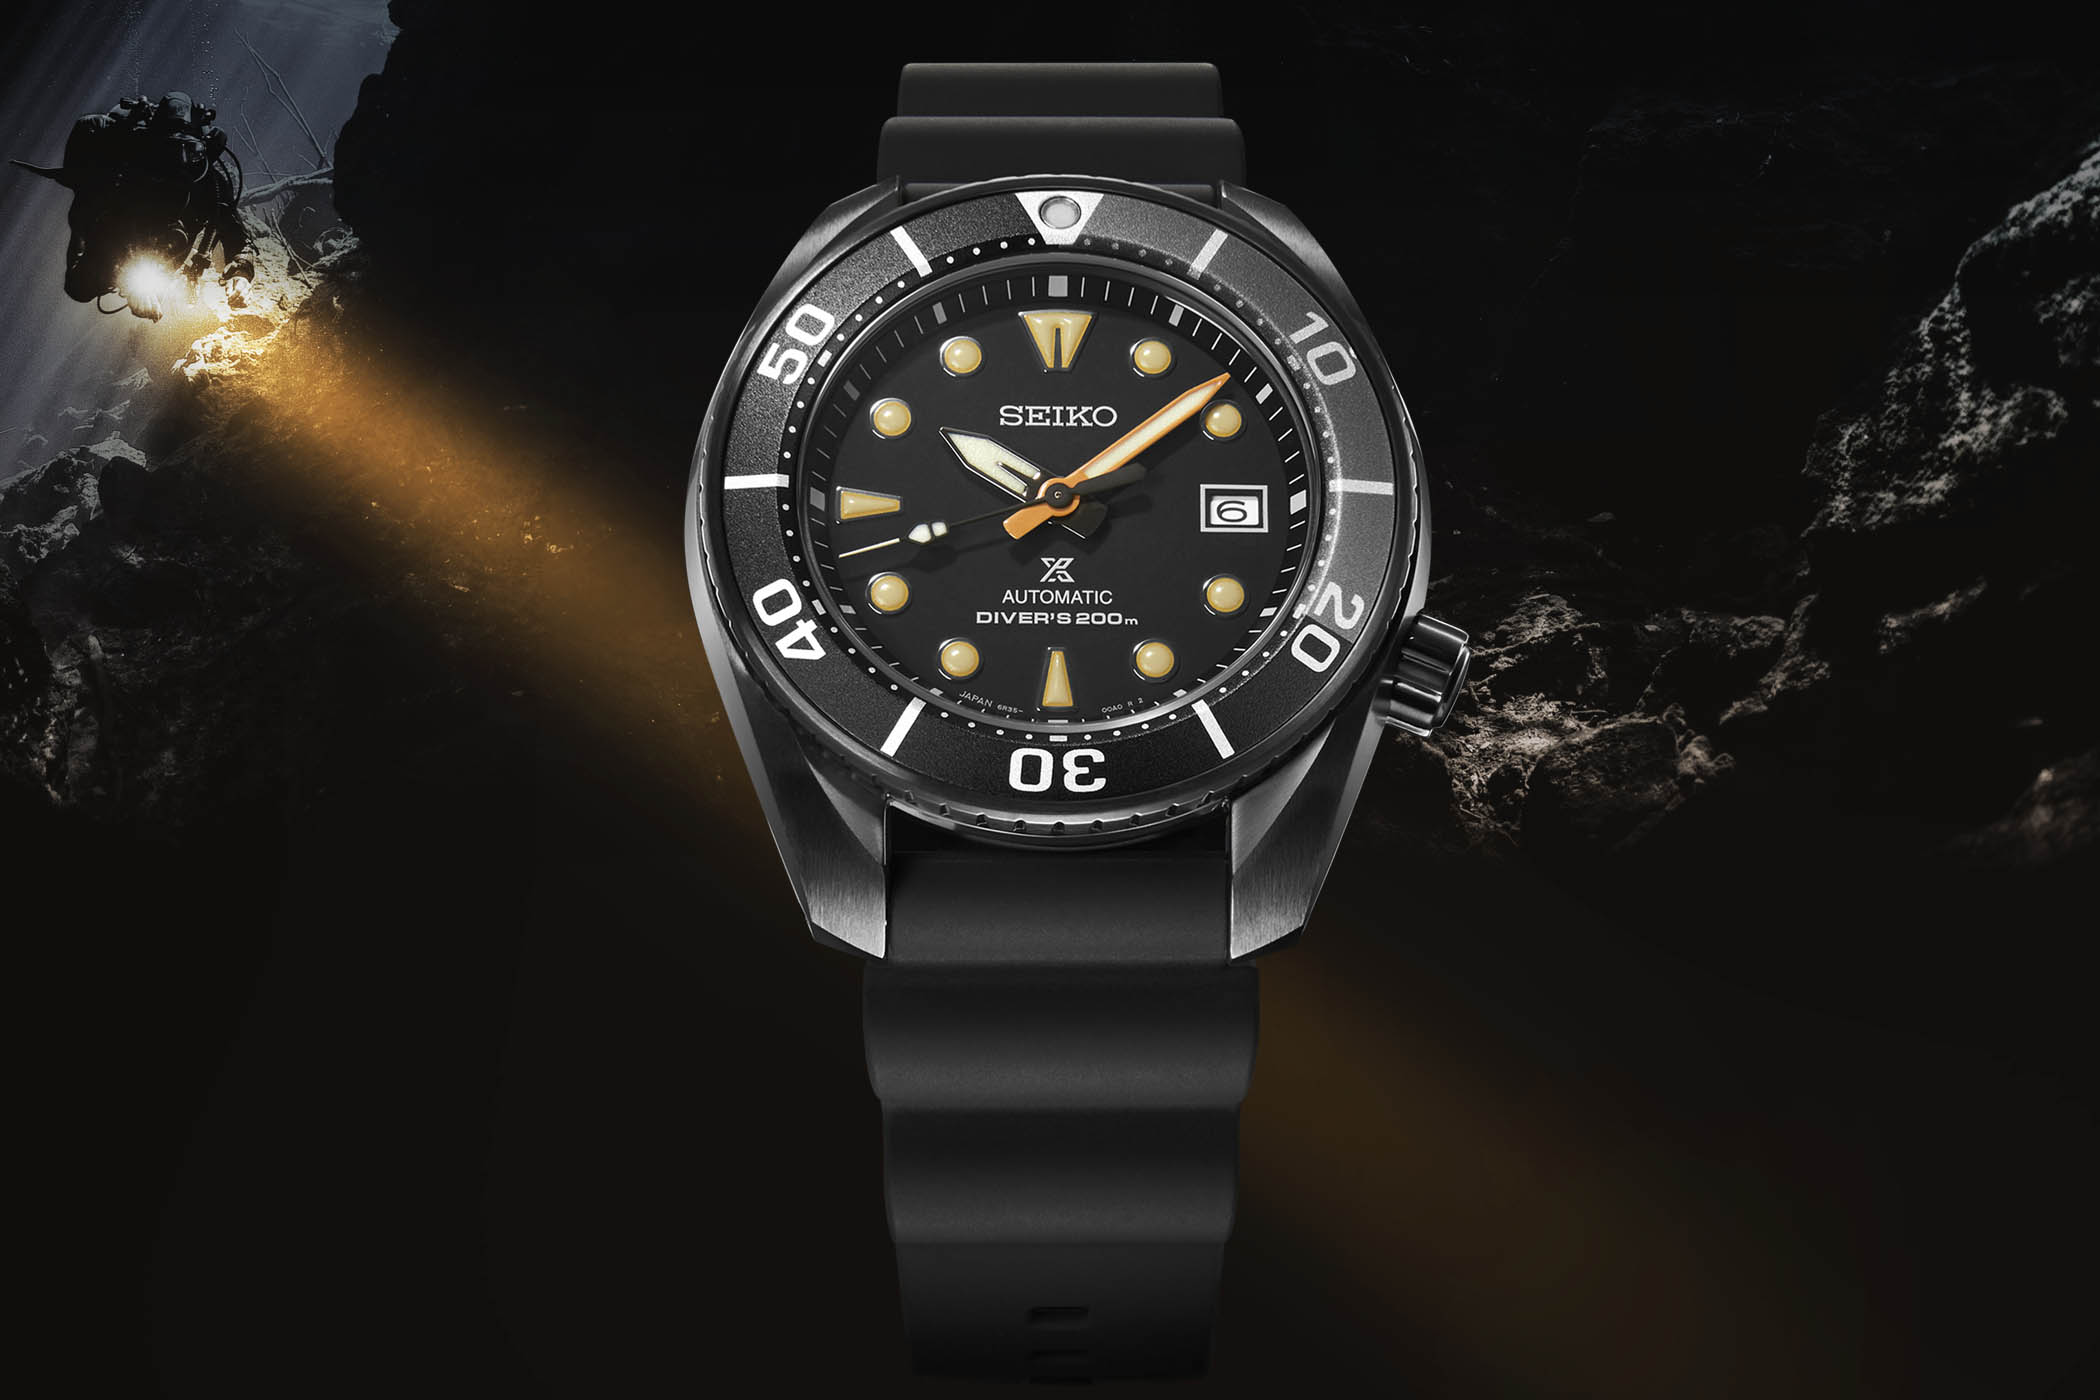 Seiko Prospex Black Series Limited Edition Sumo SPB125J1